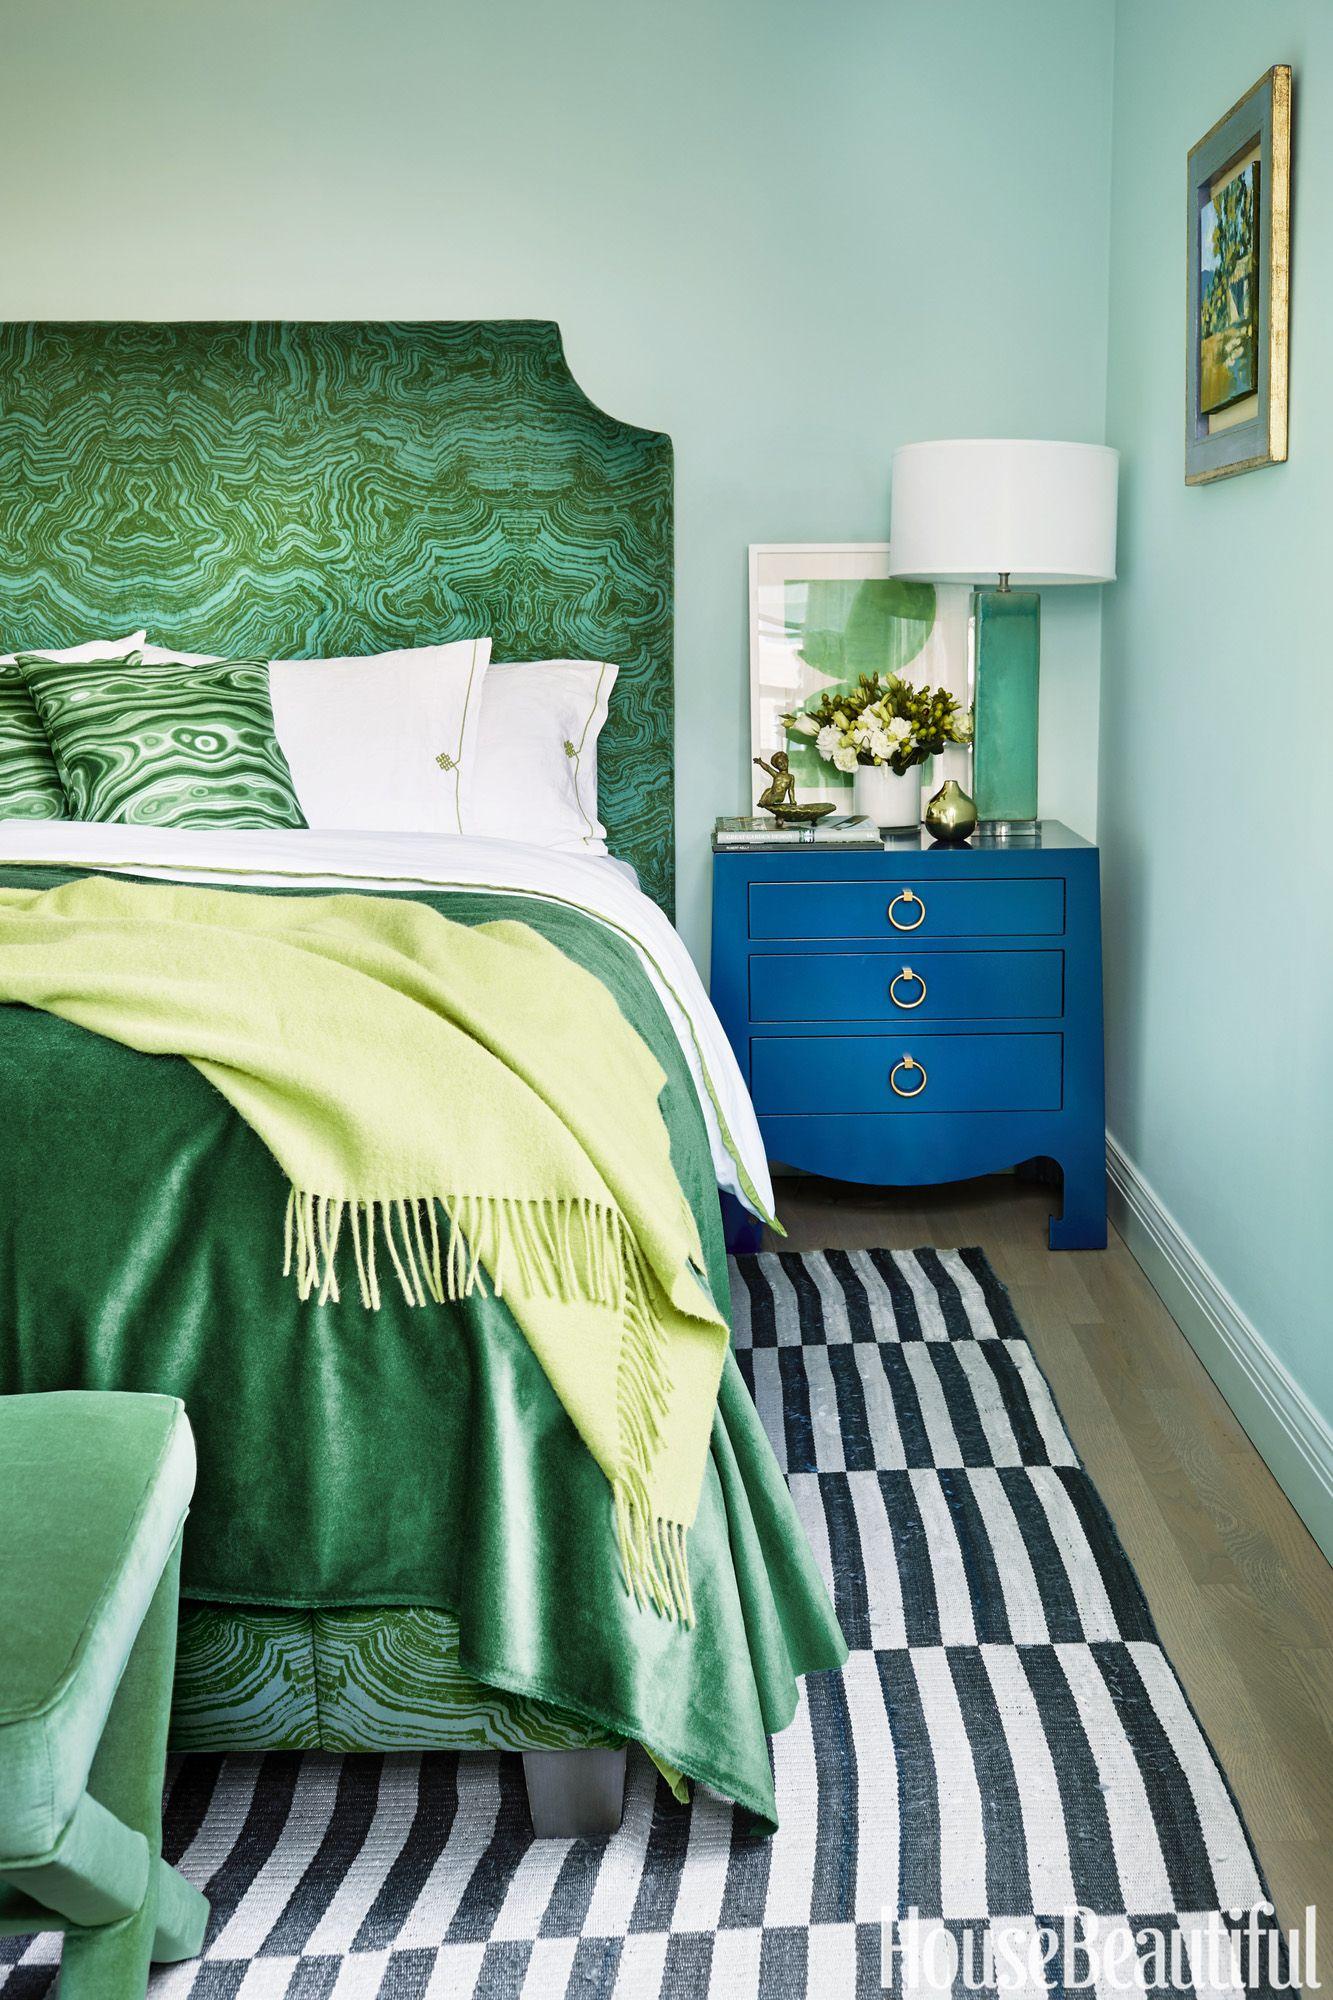 17 dreamy green bedrooms best decor ideas for green bedroom rh housebeautiful com